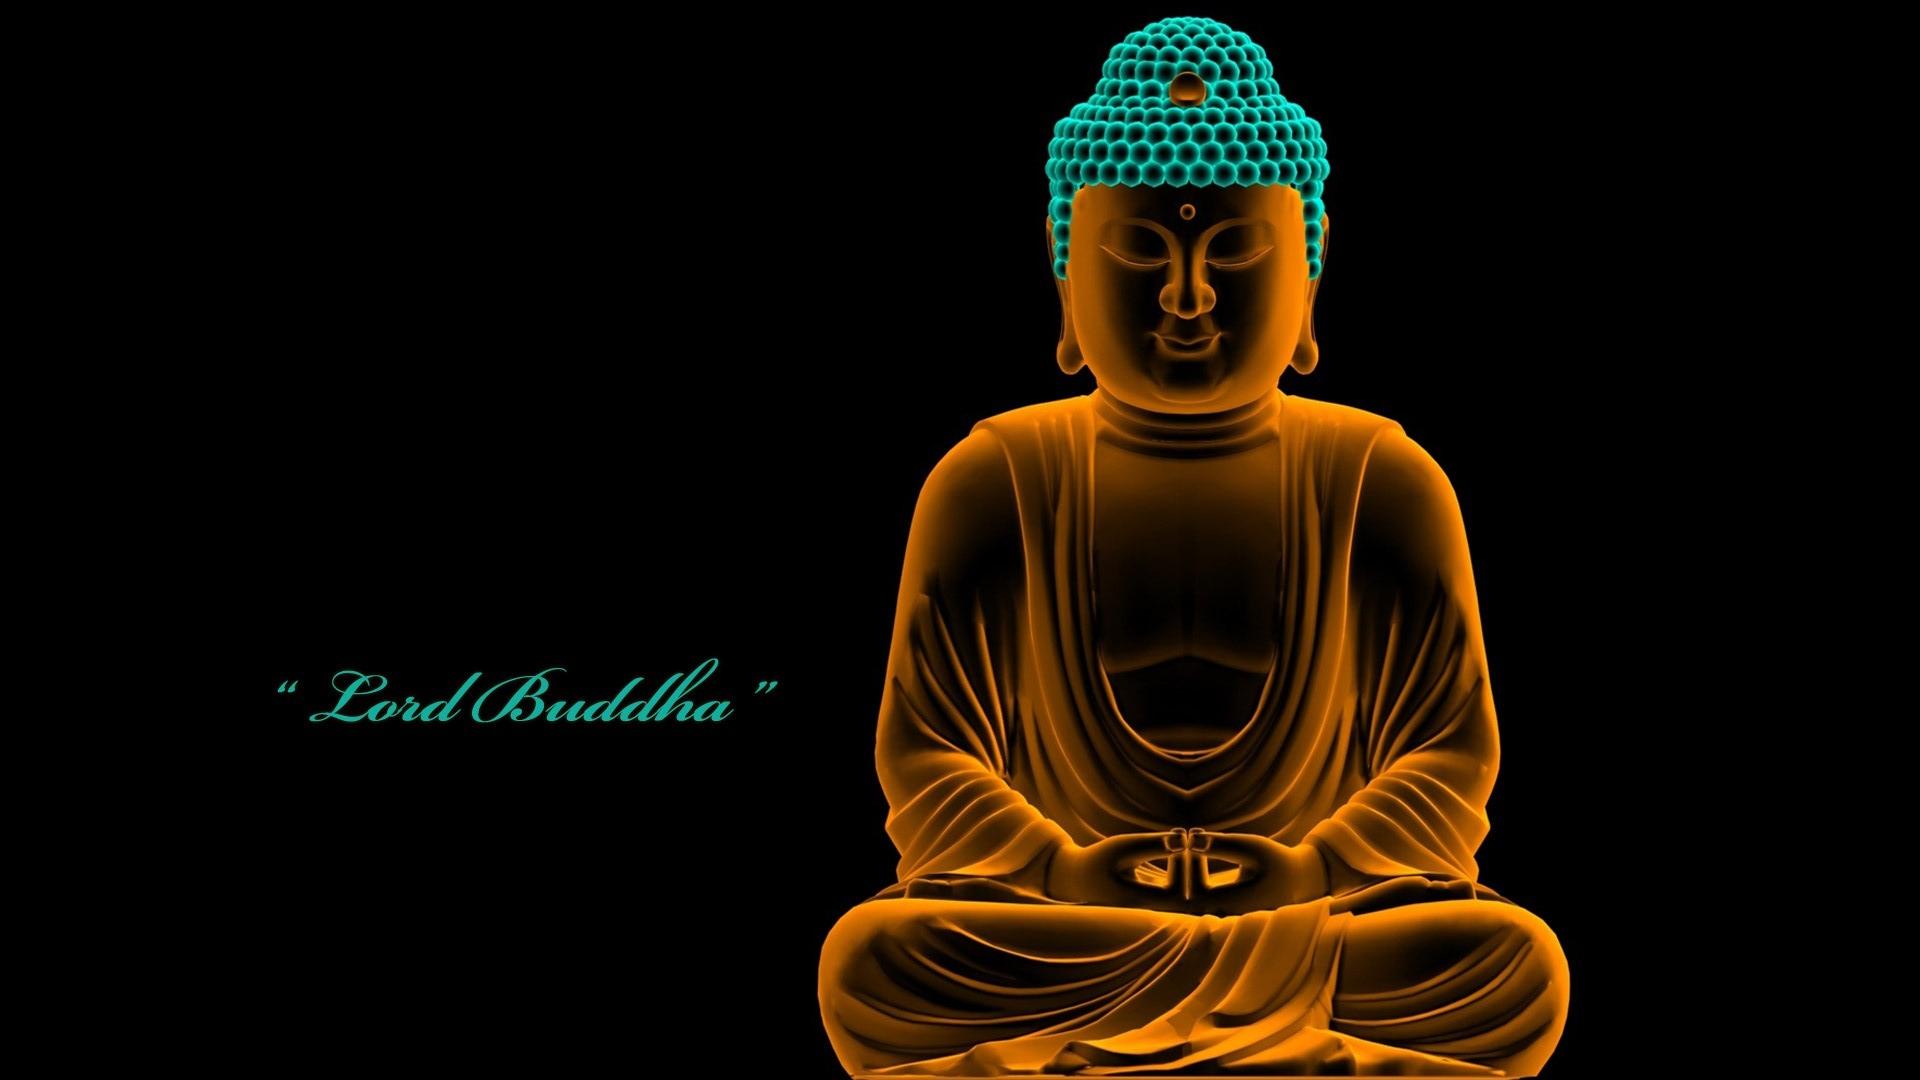 Lord Buddha Live 3D Wallpaper   New HD Wallpapers 1920x1080